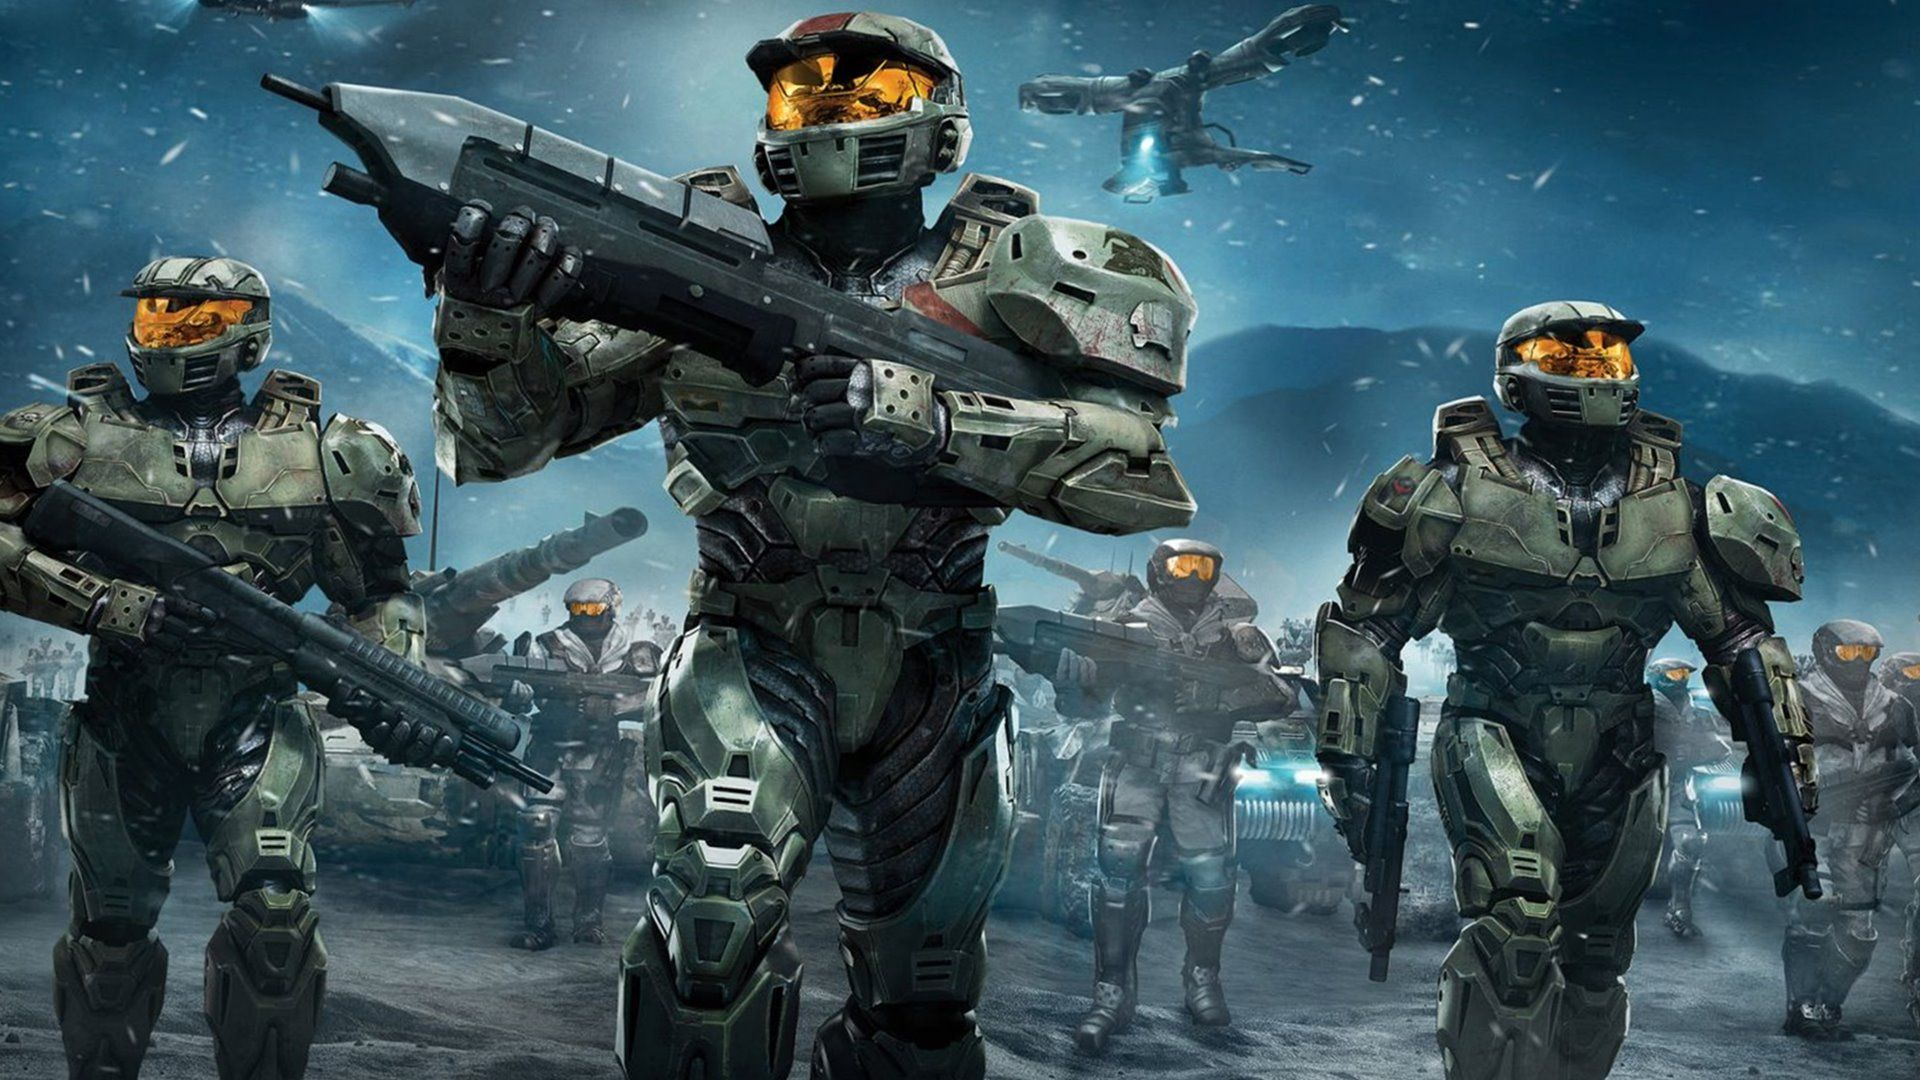 Best Halo Wars Game Wallpaper iCon Wallpaper HD Сериалы